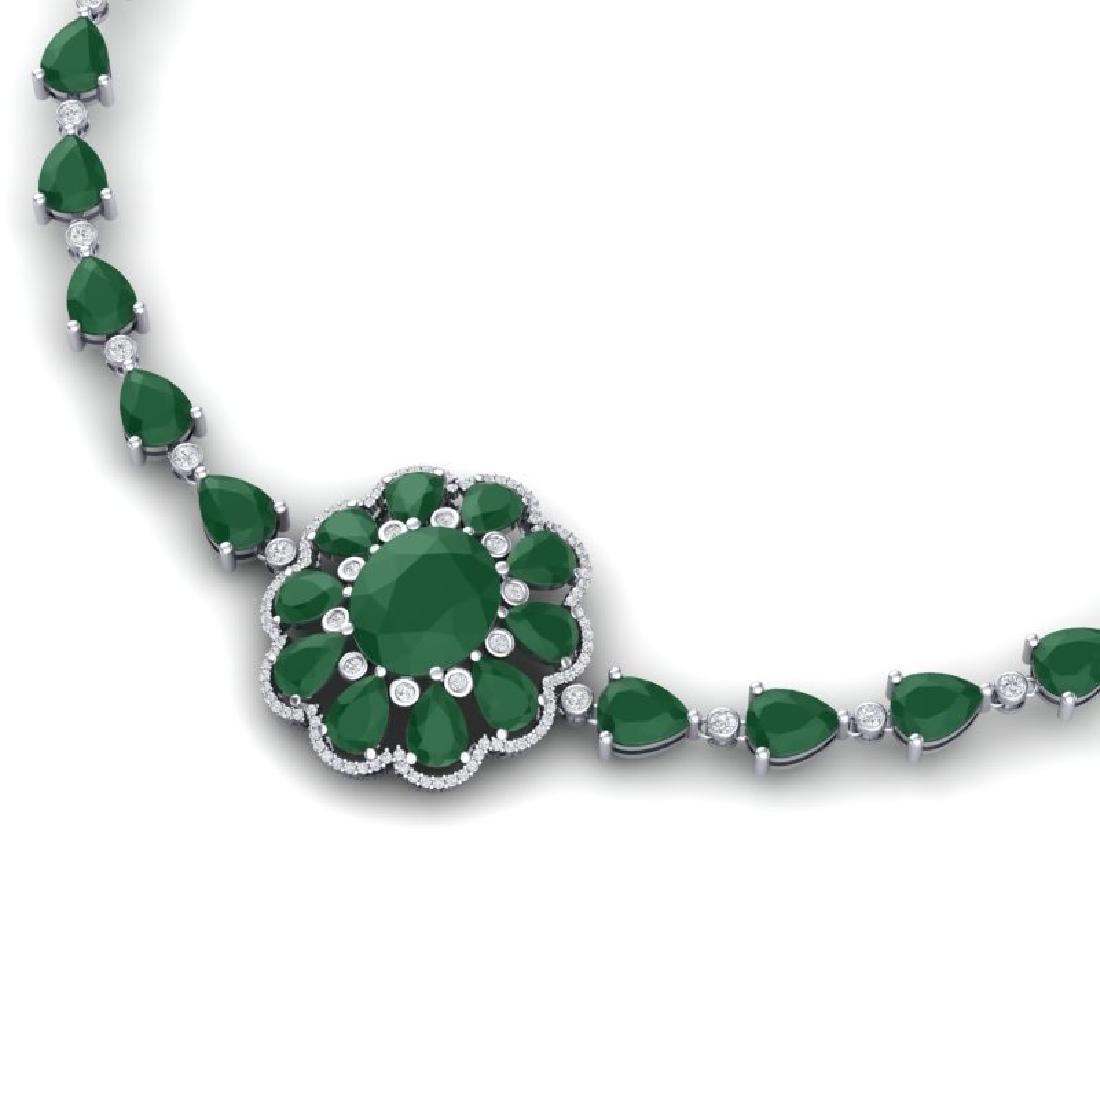 78.98 CTW Royalty Emerald & VS Diamond Necklace 18K